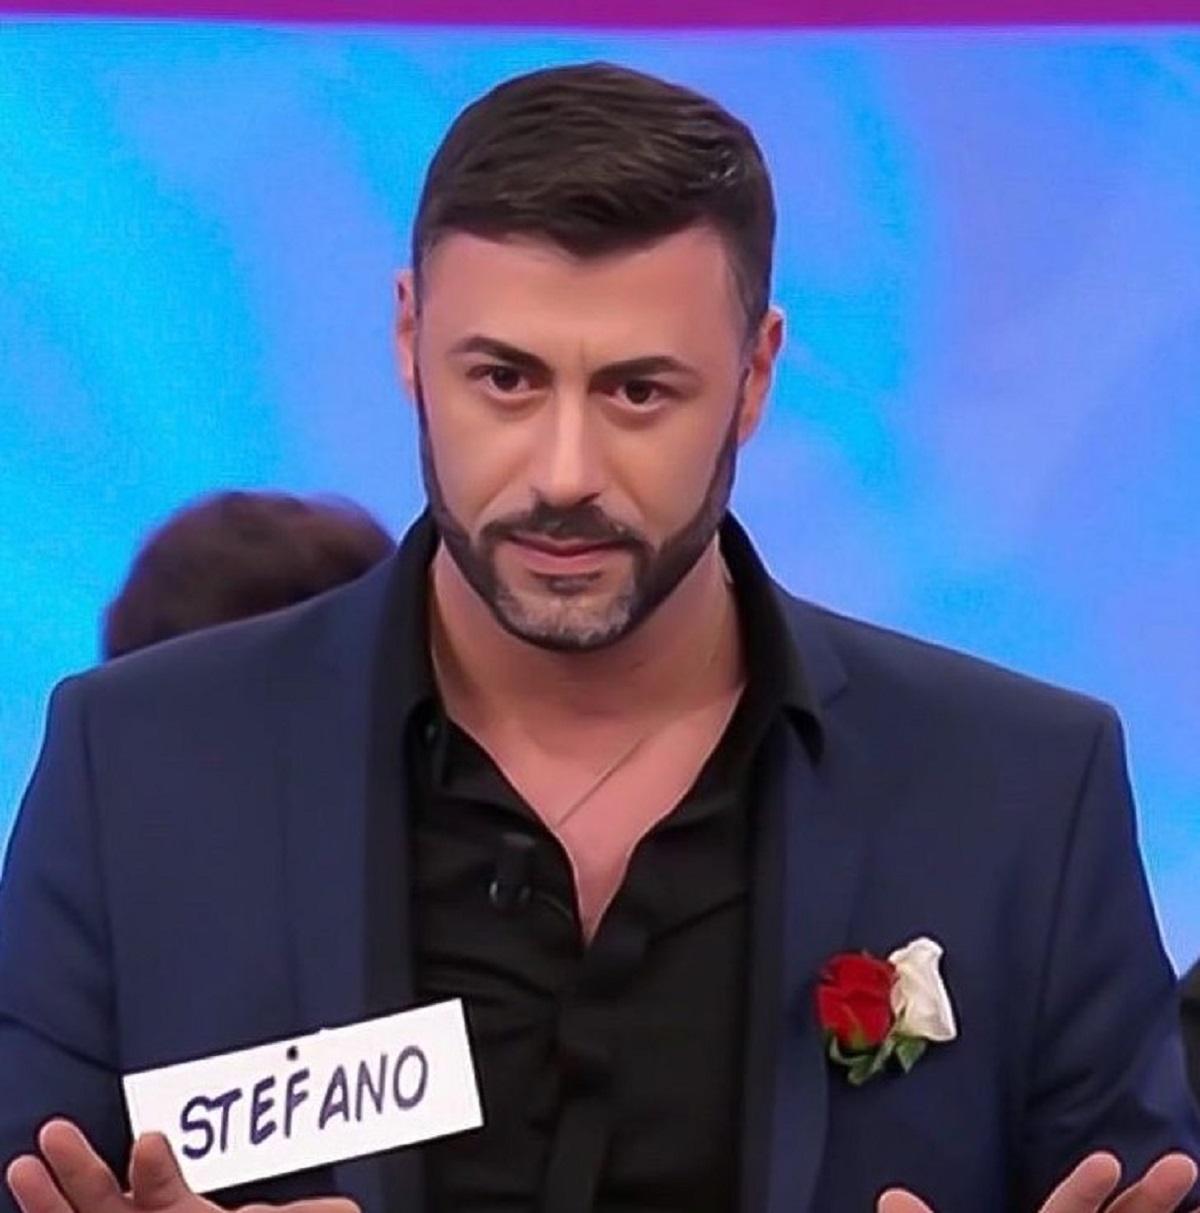 Stefano Torresi